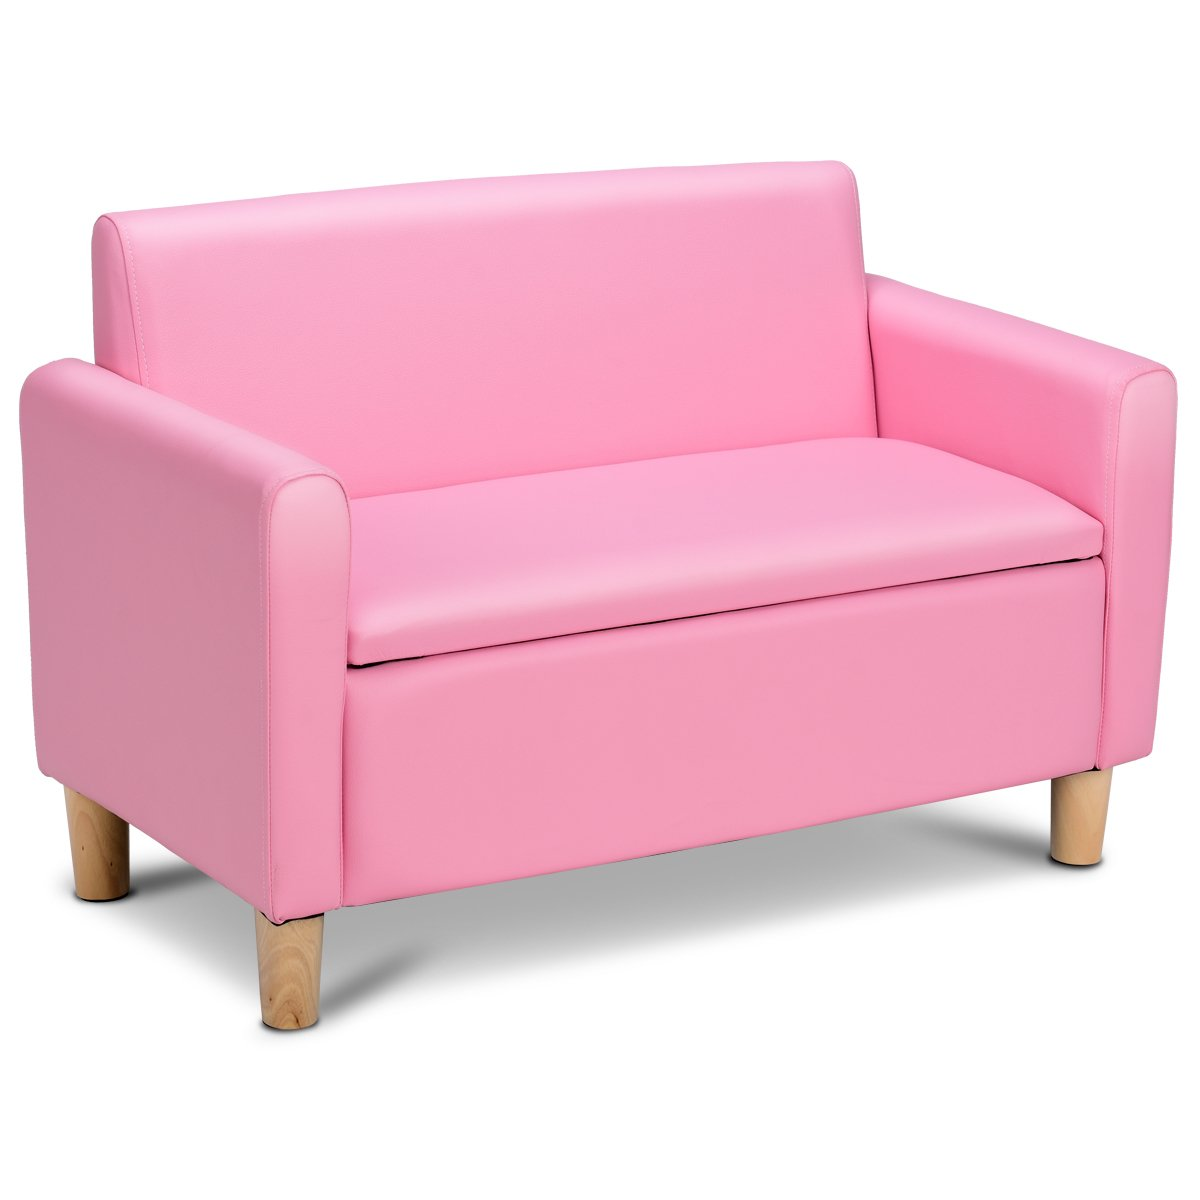 COSTWAY Kindersessel Sessel Sofa Kindersofa Kindercouch Babysessel Kindermöbel 80x41x53cm (Rosa)